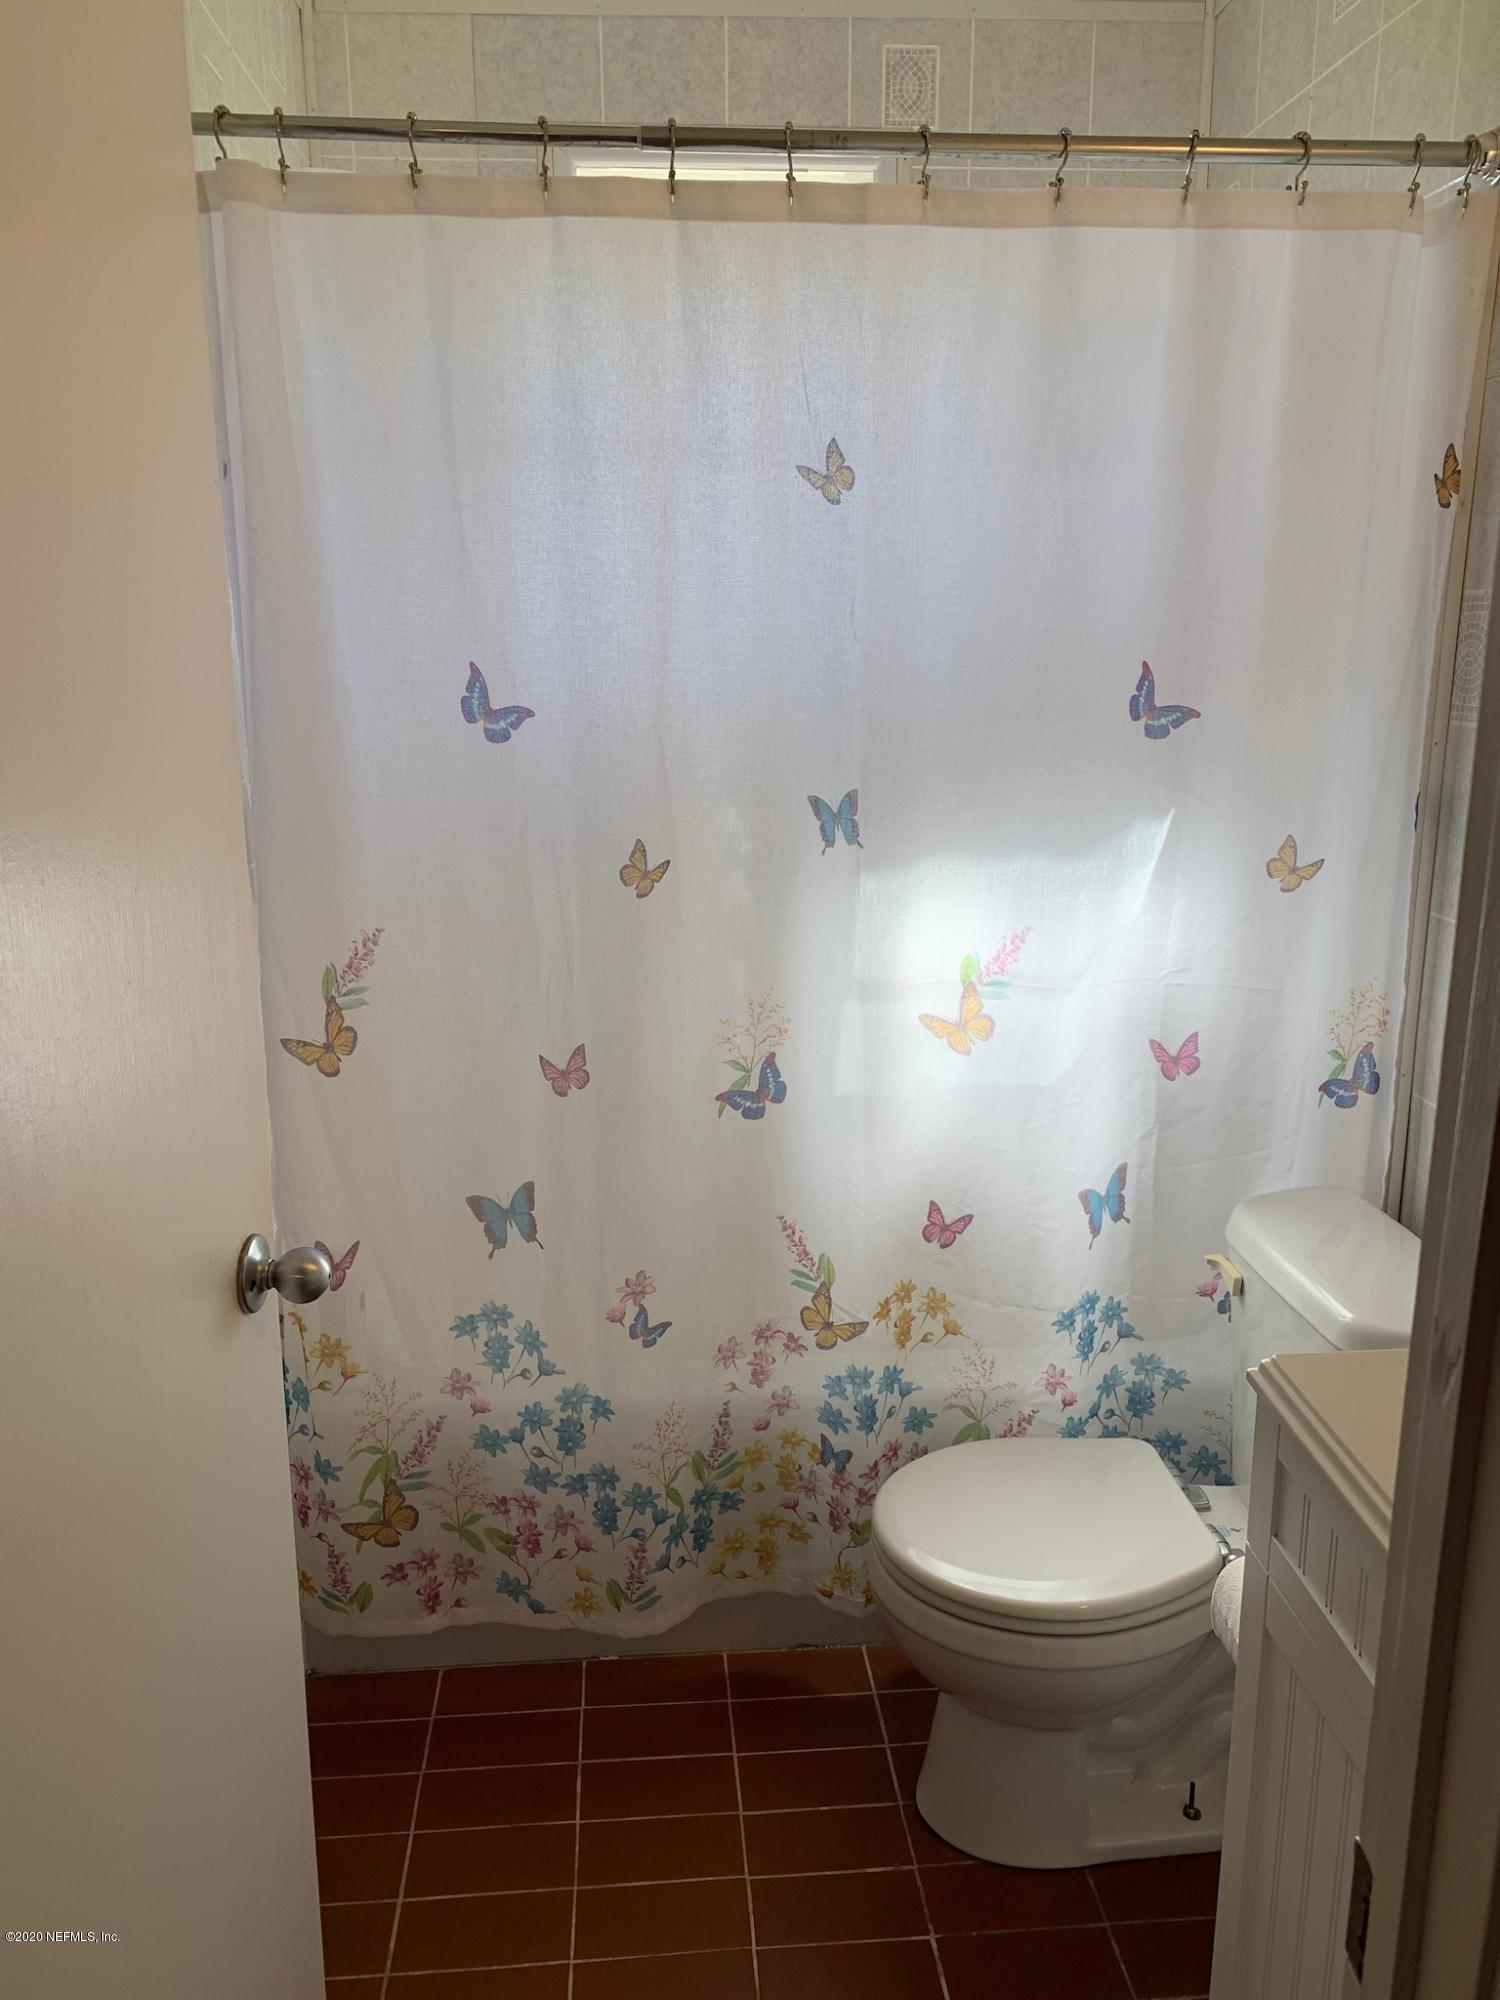 6620 JAMES BRITT, GLEN ST. MARY, FLORIDA 32040, ,3 BathroomsBathrooms,Residential,For sale,JAMES BRITT,1080474